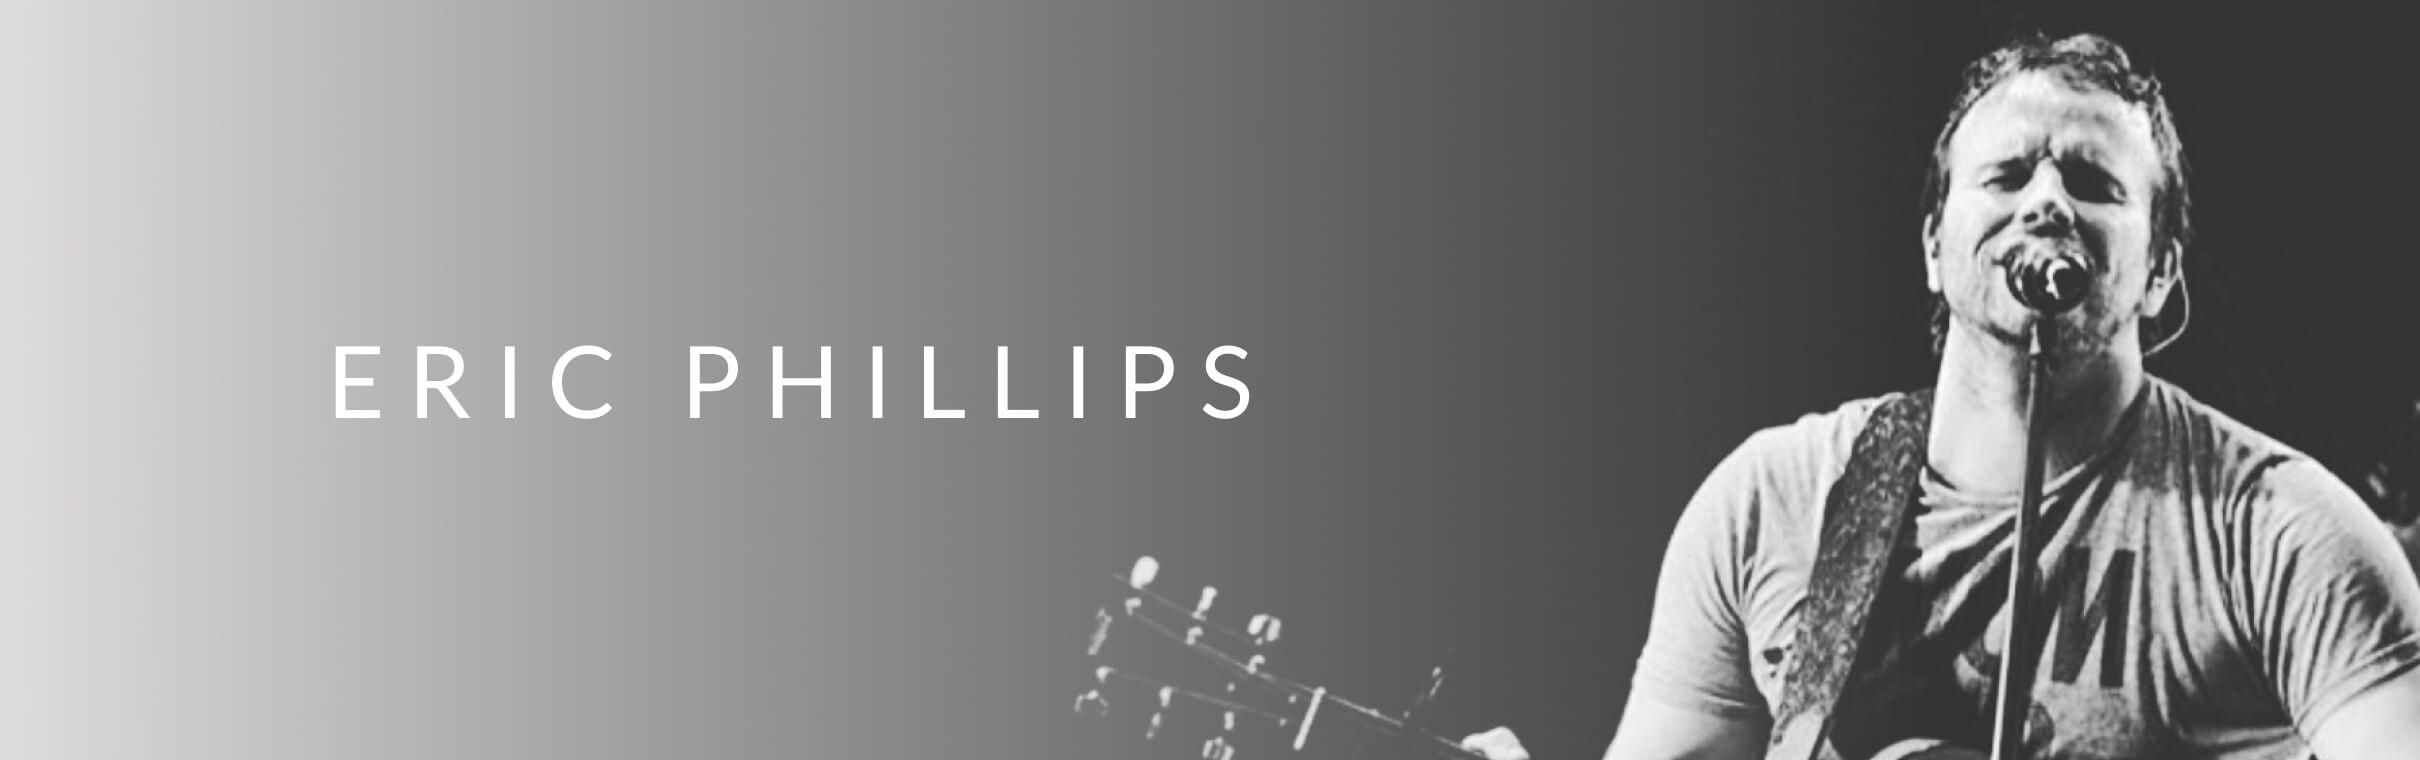 Eric Phillips